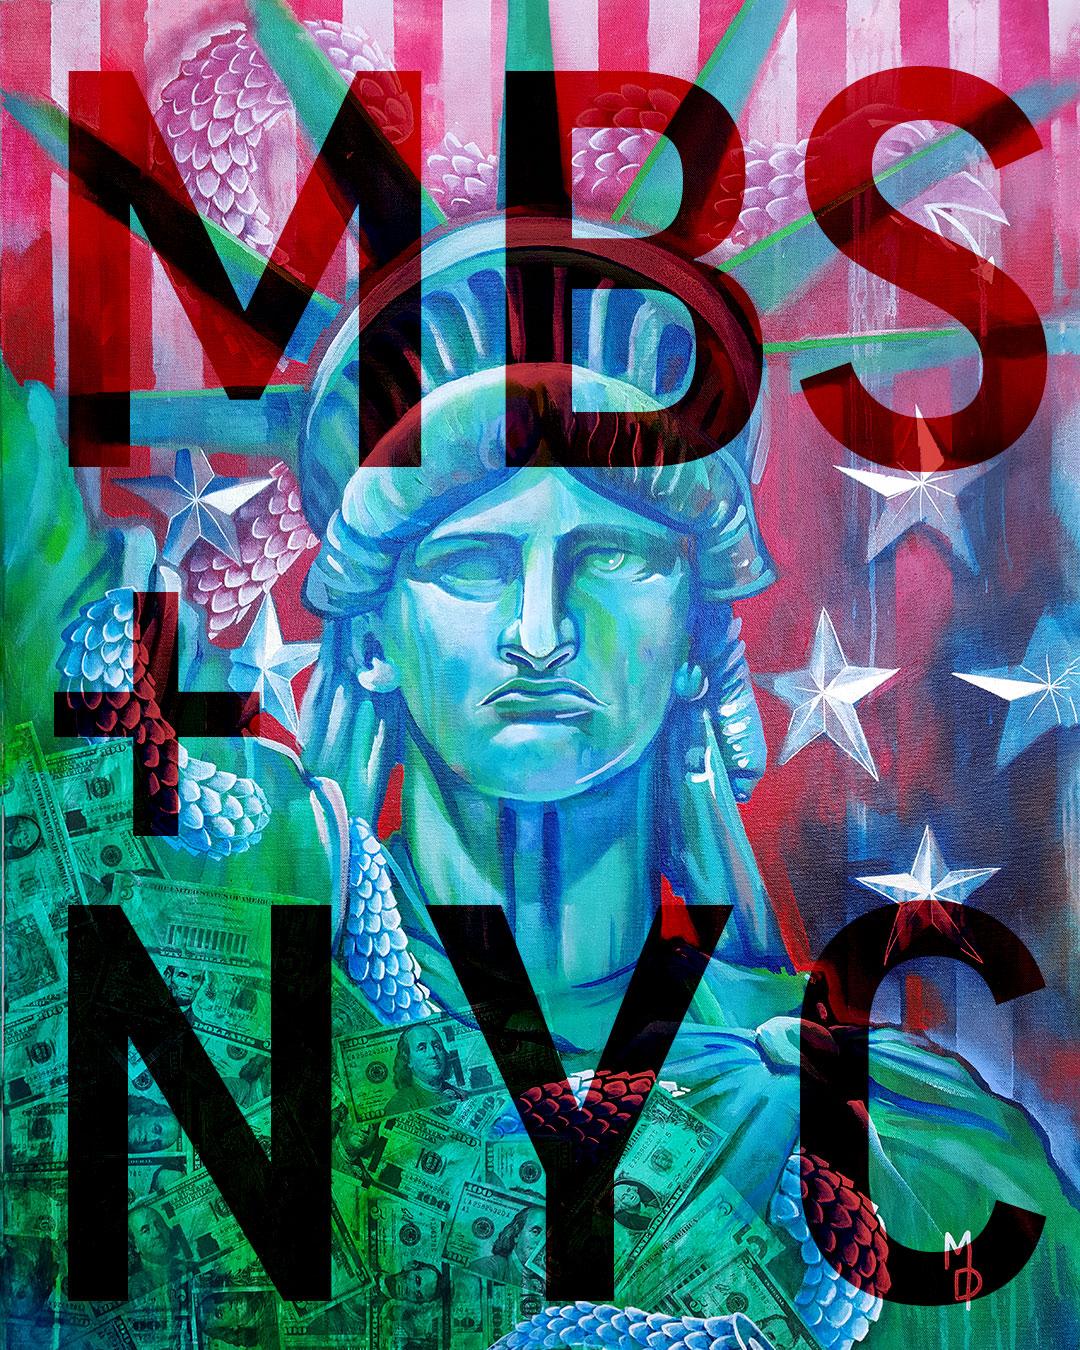 MBS + NYC | Massive Burn Exhibits at Superfine Art Fair NYC | Massive Burn Studios